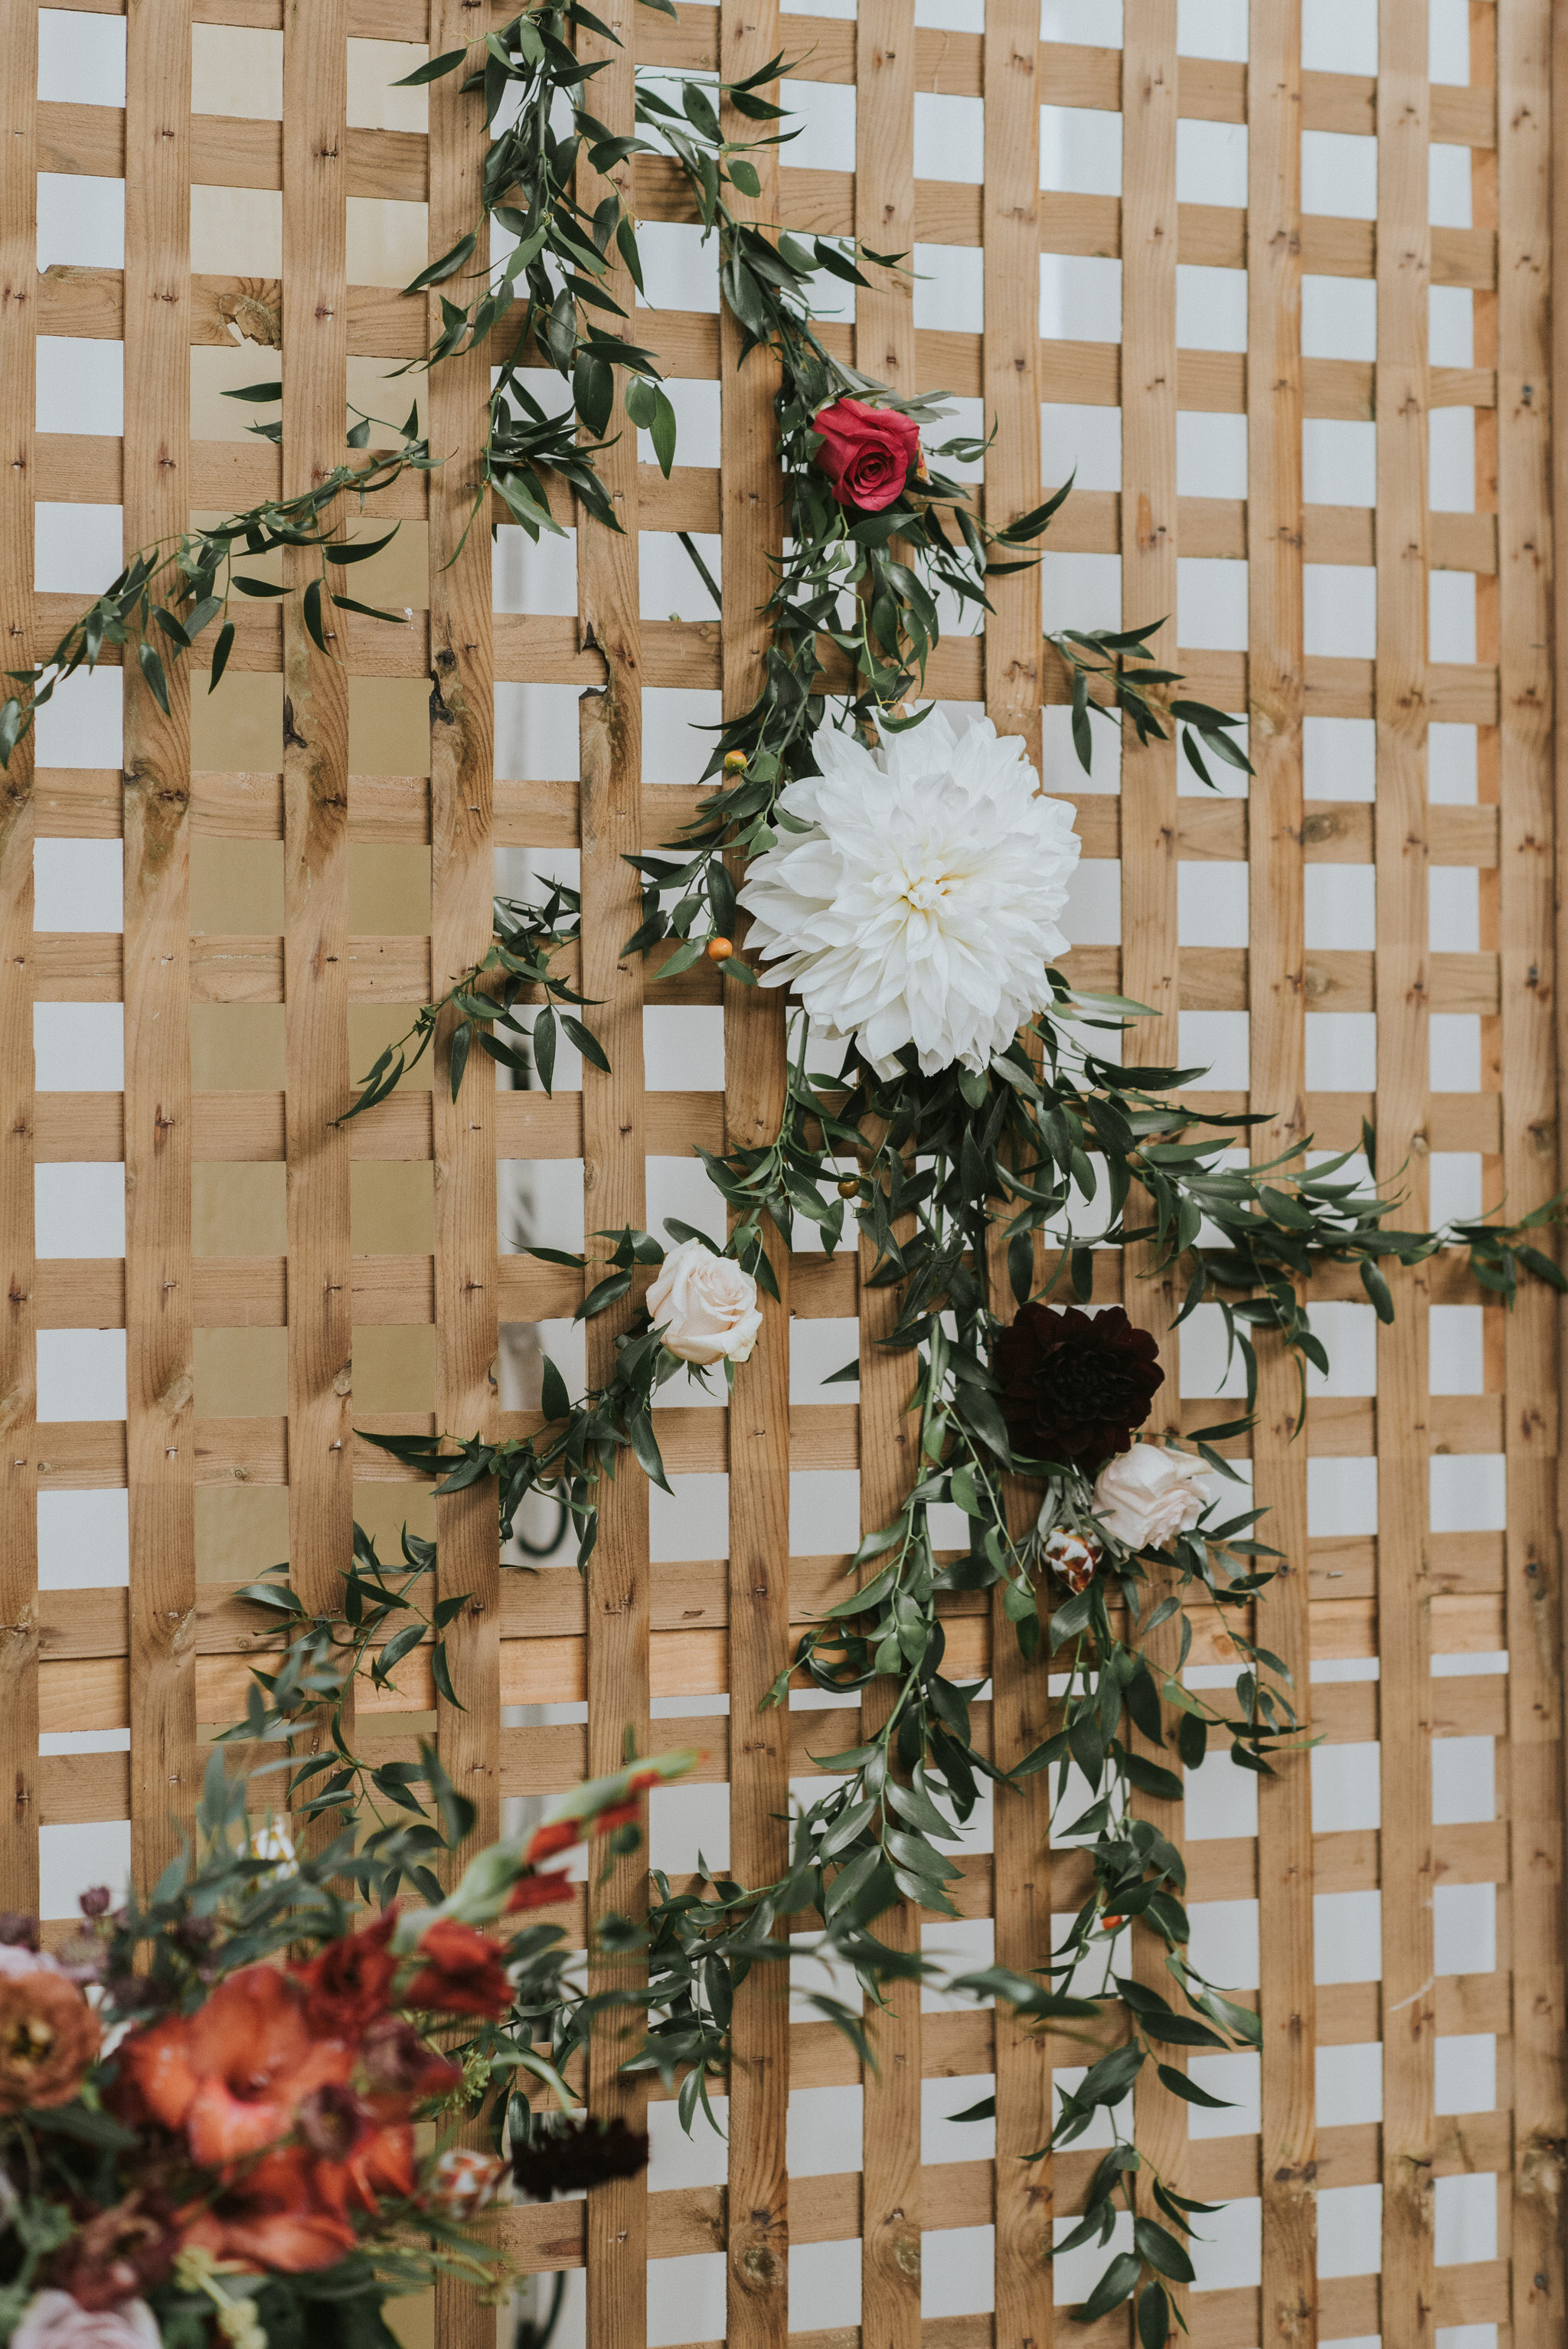 scarletoneillphotography_weddingphotography_prince edward county weddings080.JPG